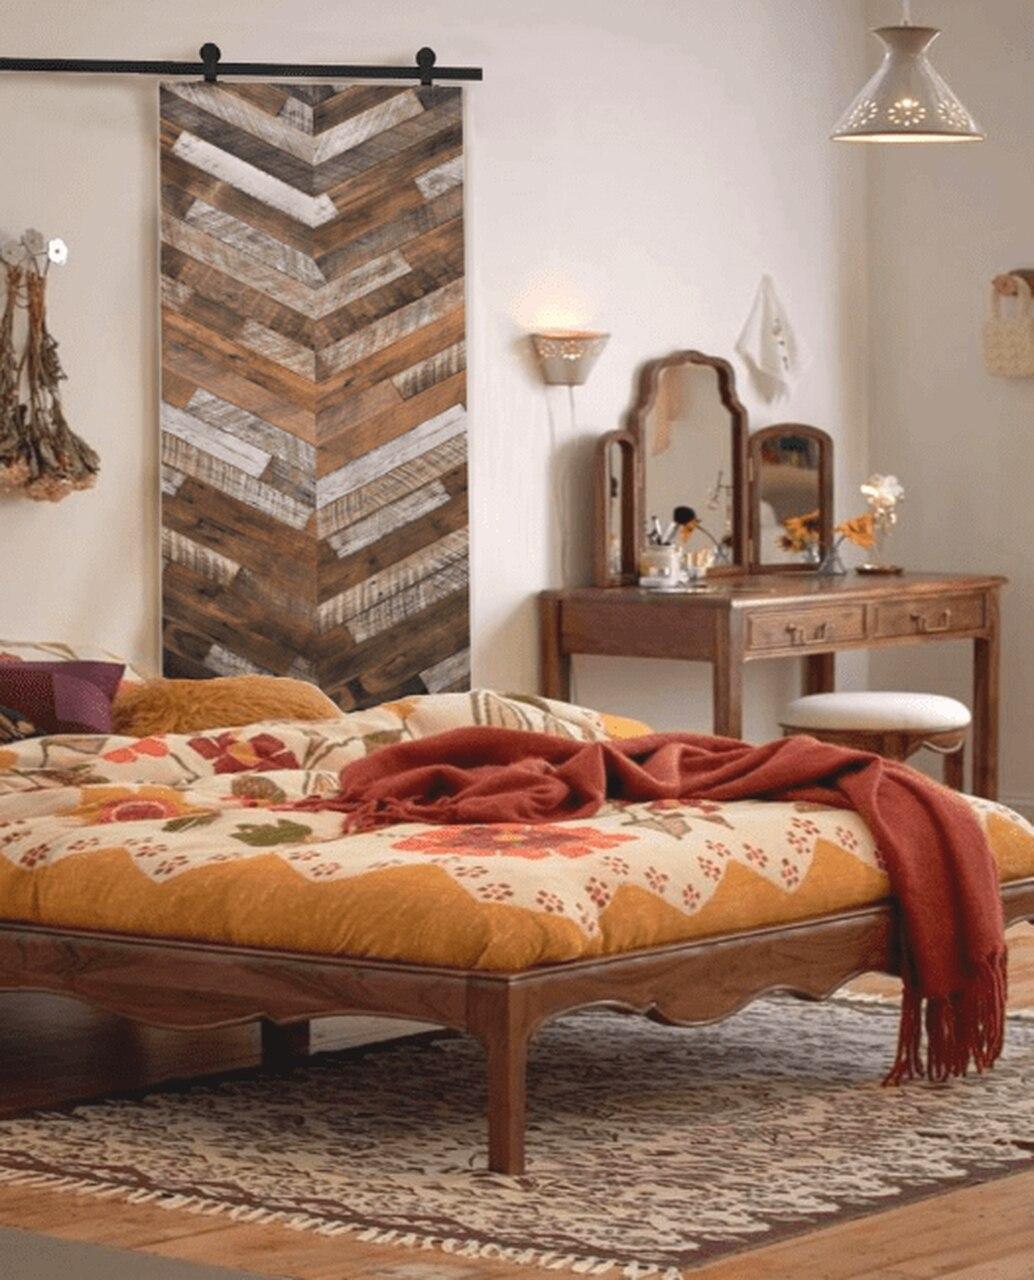 bedroom-reclaimed-wood-sliding-barn-door.jpg